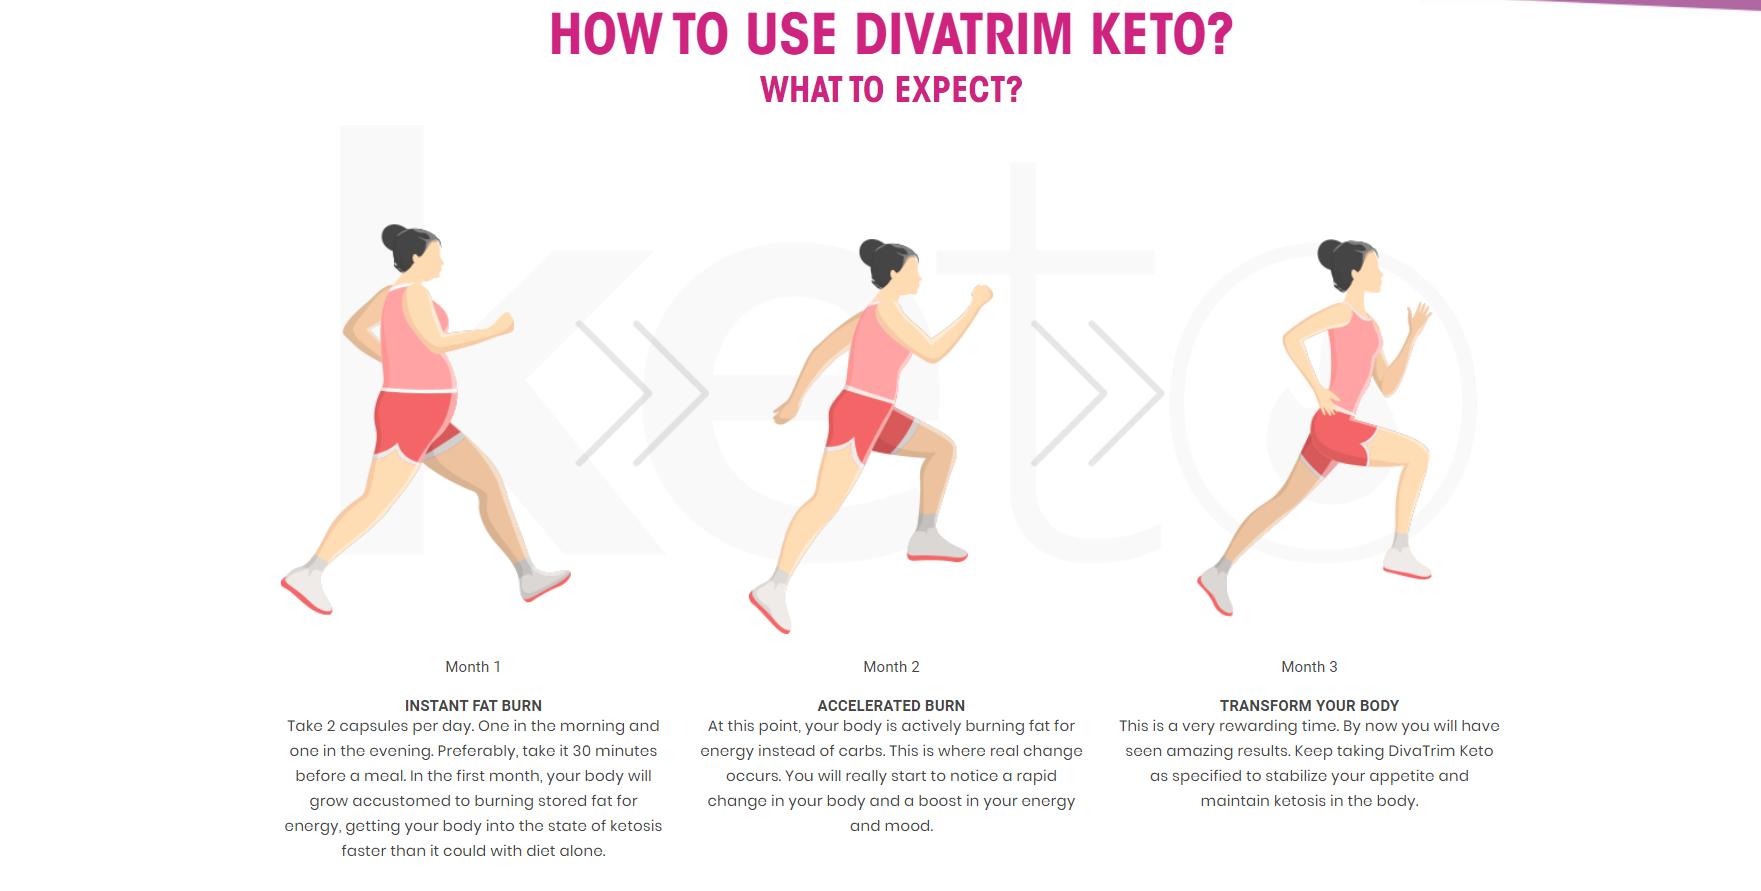 Divatrim Keto Reviews [100% Legit Pills] A Fitting Weight Loss Option!